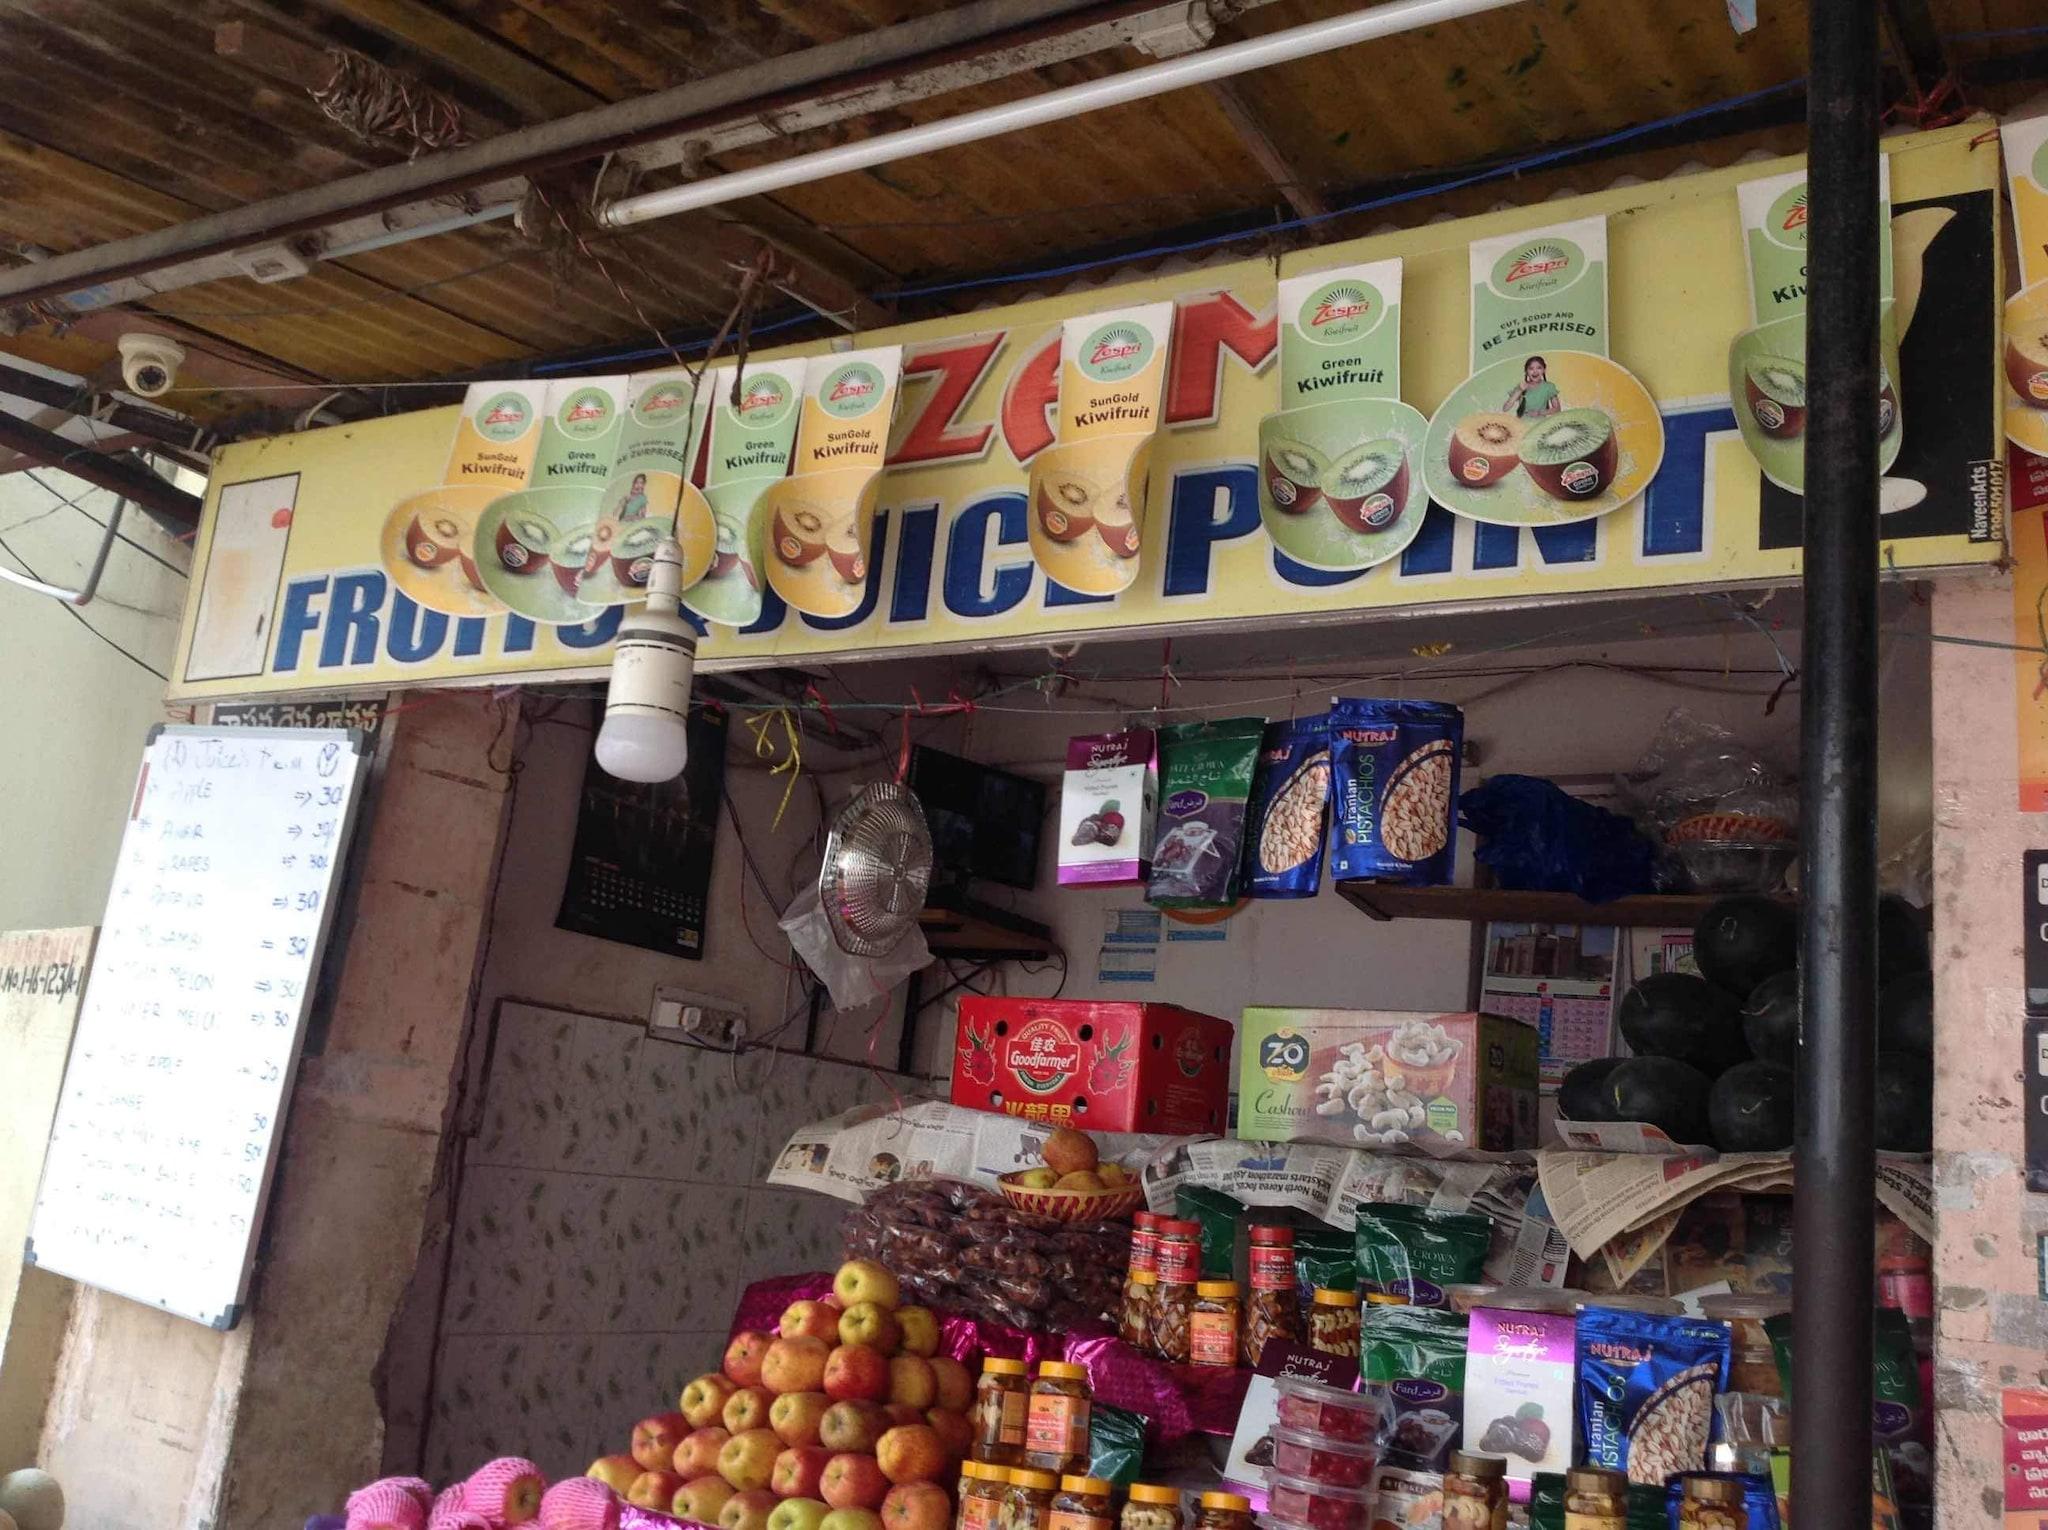 Top 100 Fruit Wholesalers in Hyderabad - Best Fruit Suppliers - Justdial